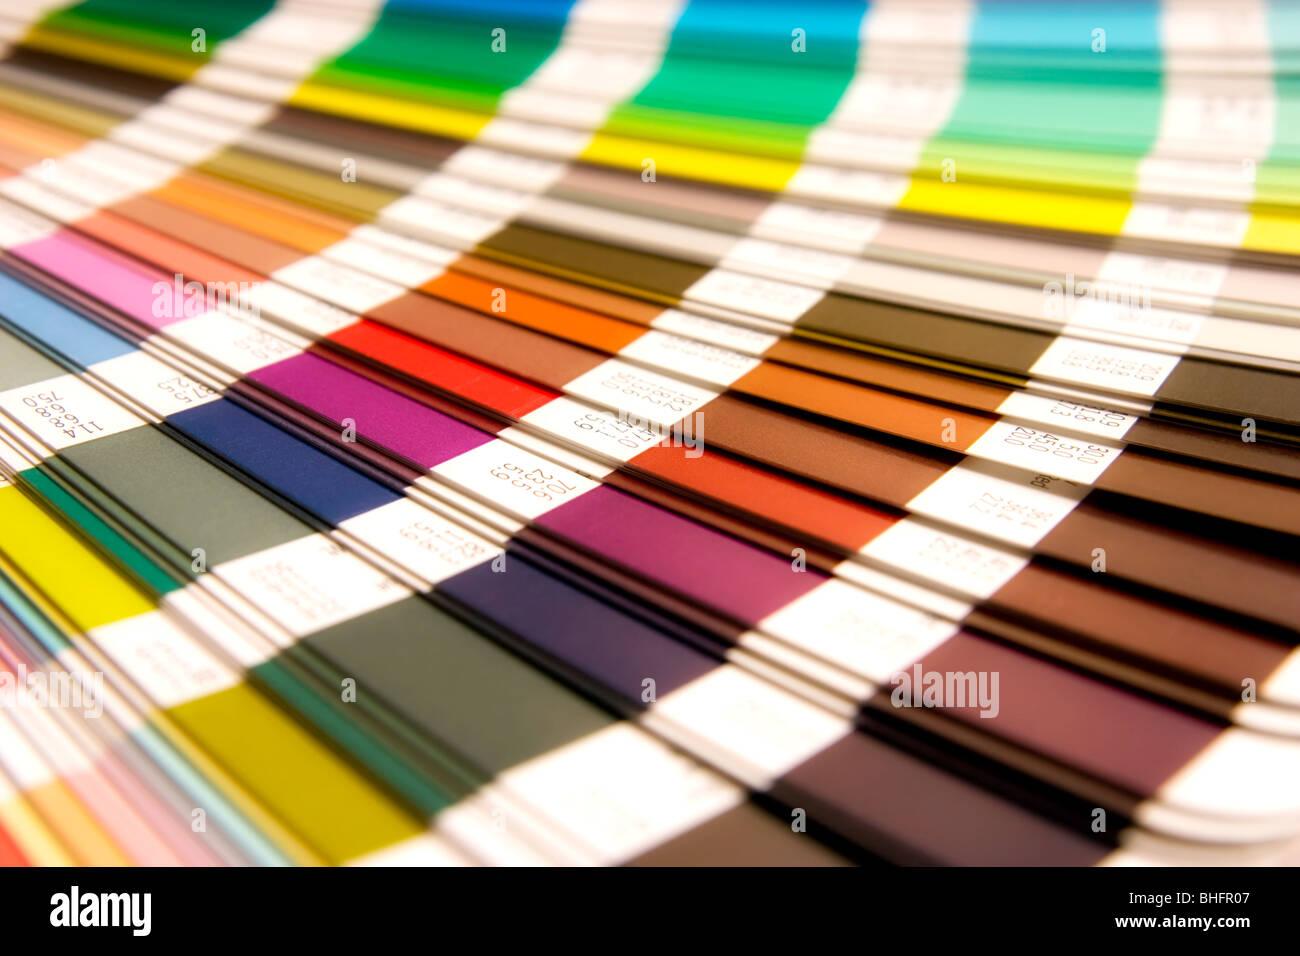 open Pantone sample colors catalogue - Stock Image